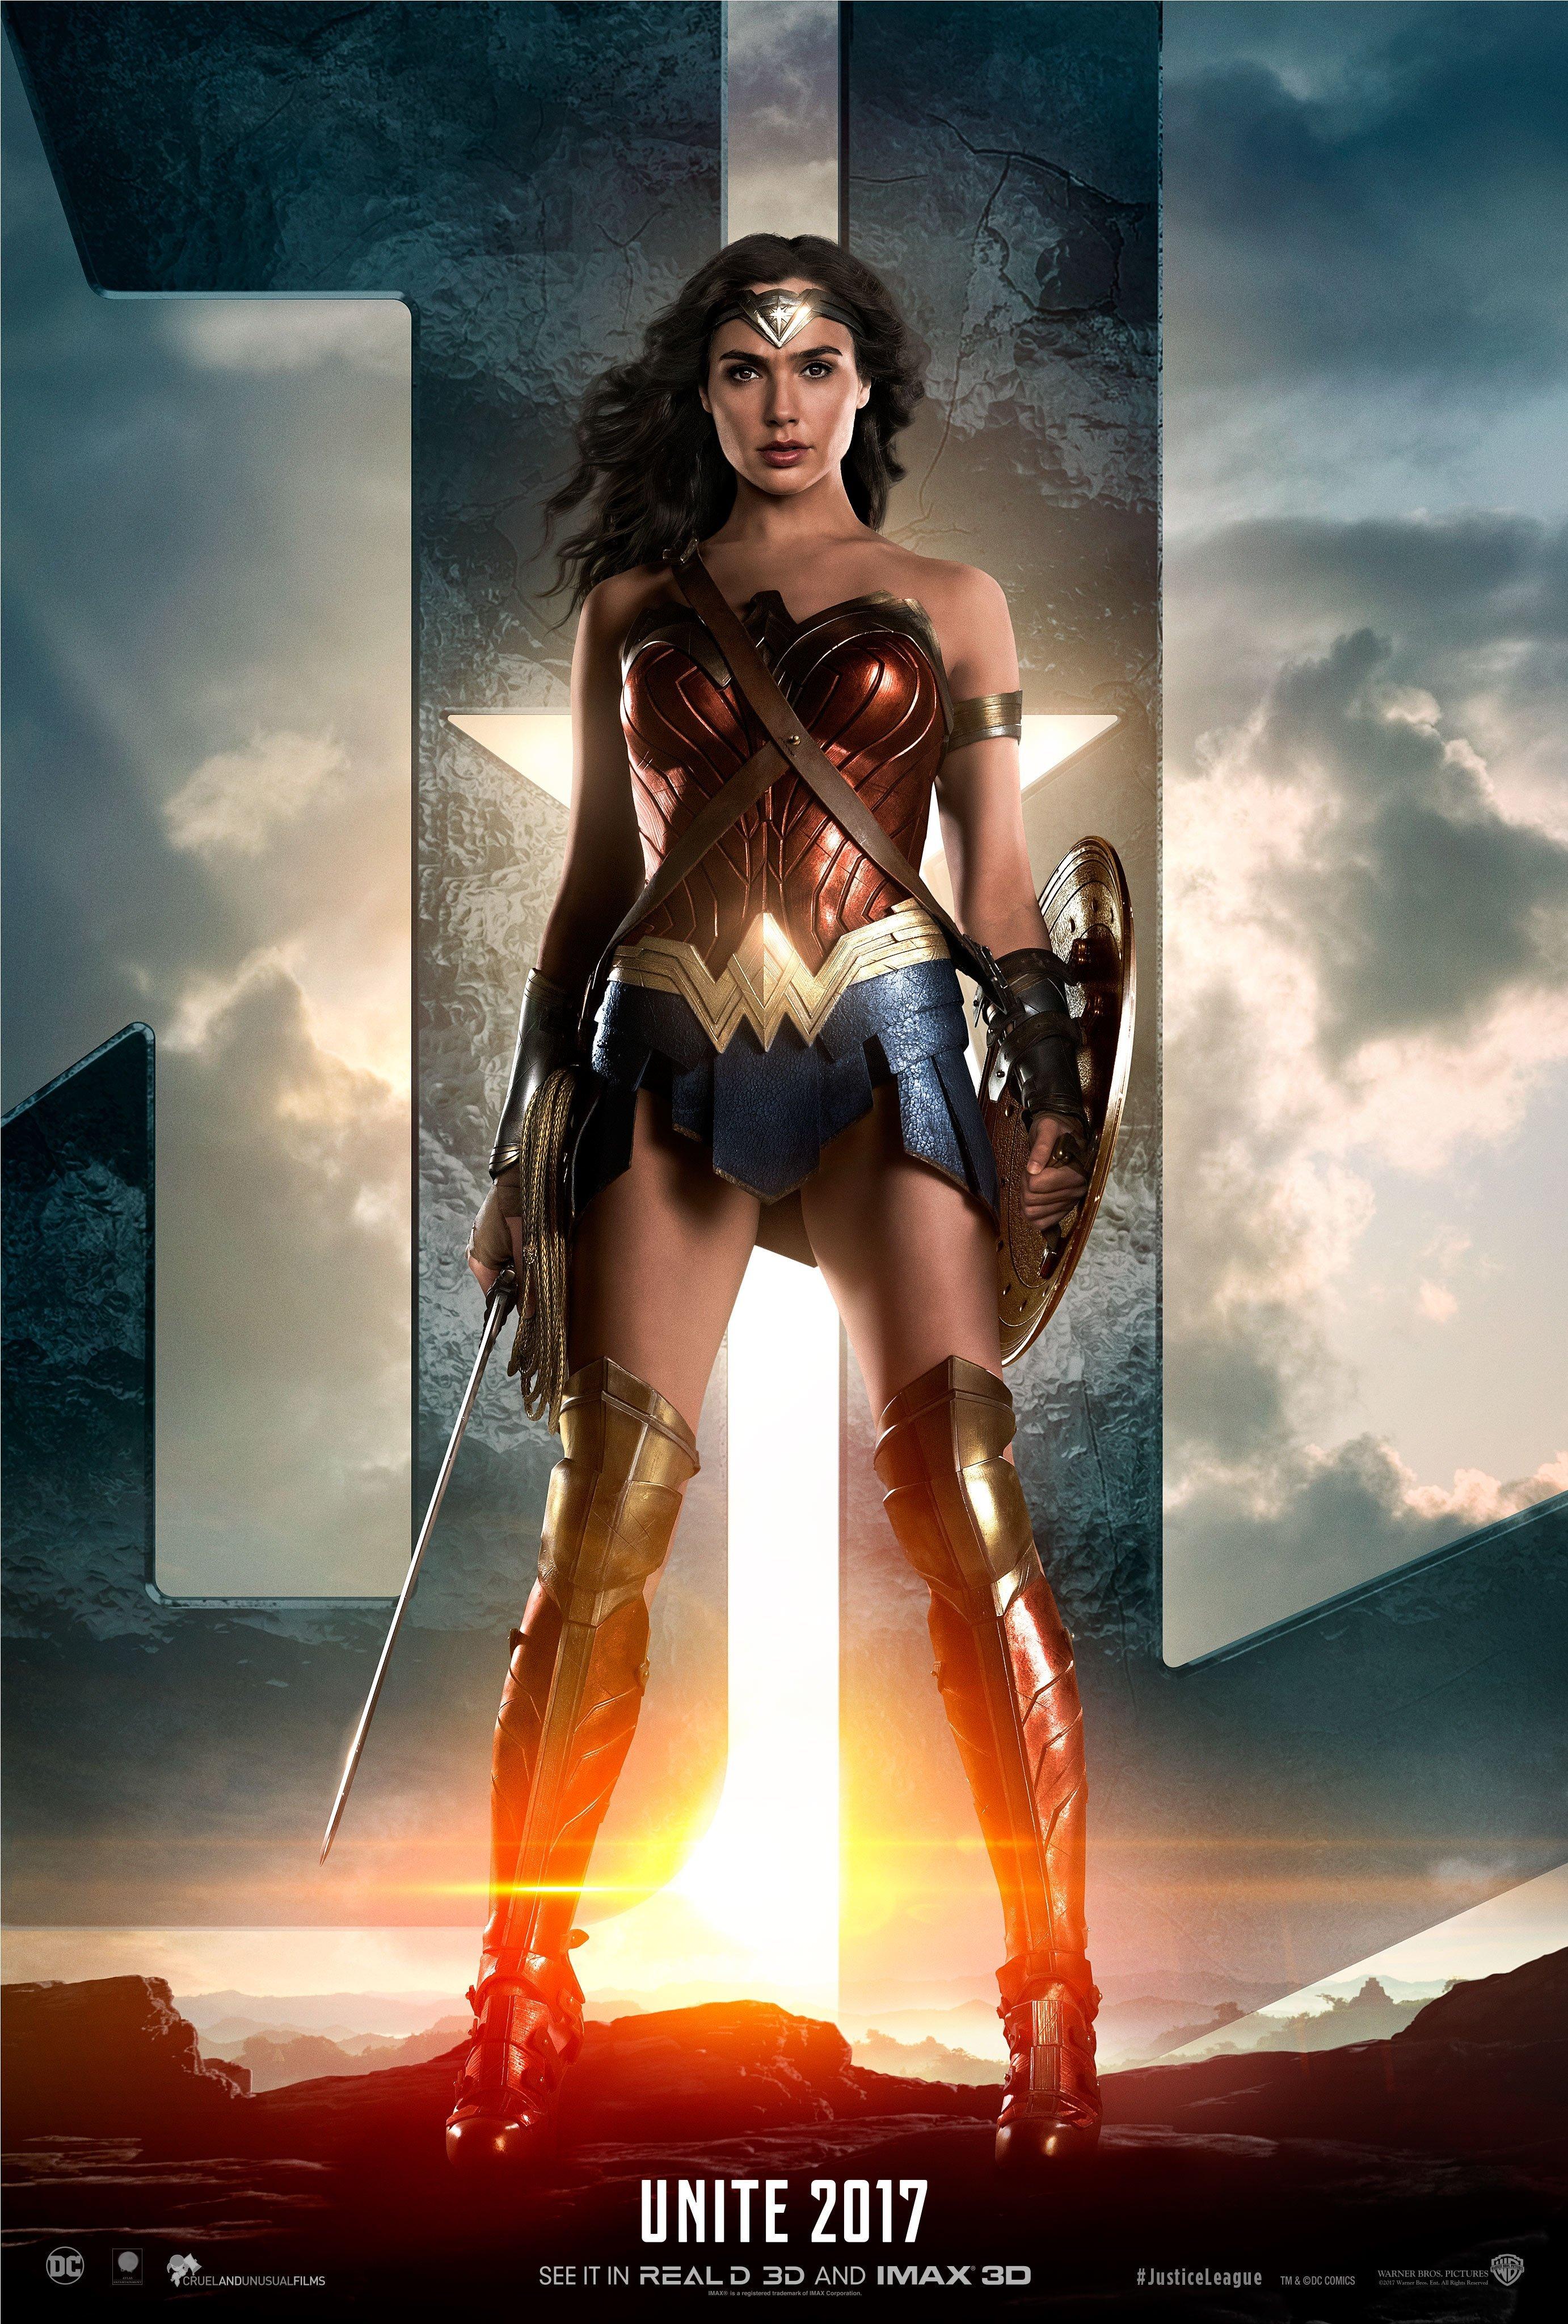 Gal Gadot Images Justice League 2017 Poster Gal Gadot As Wonder